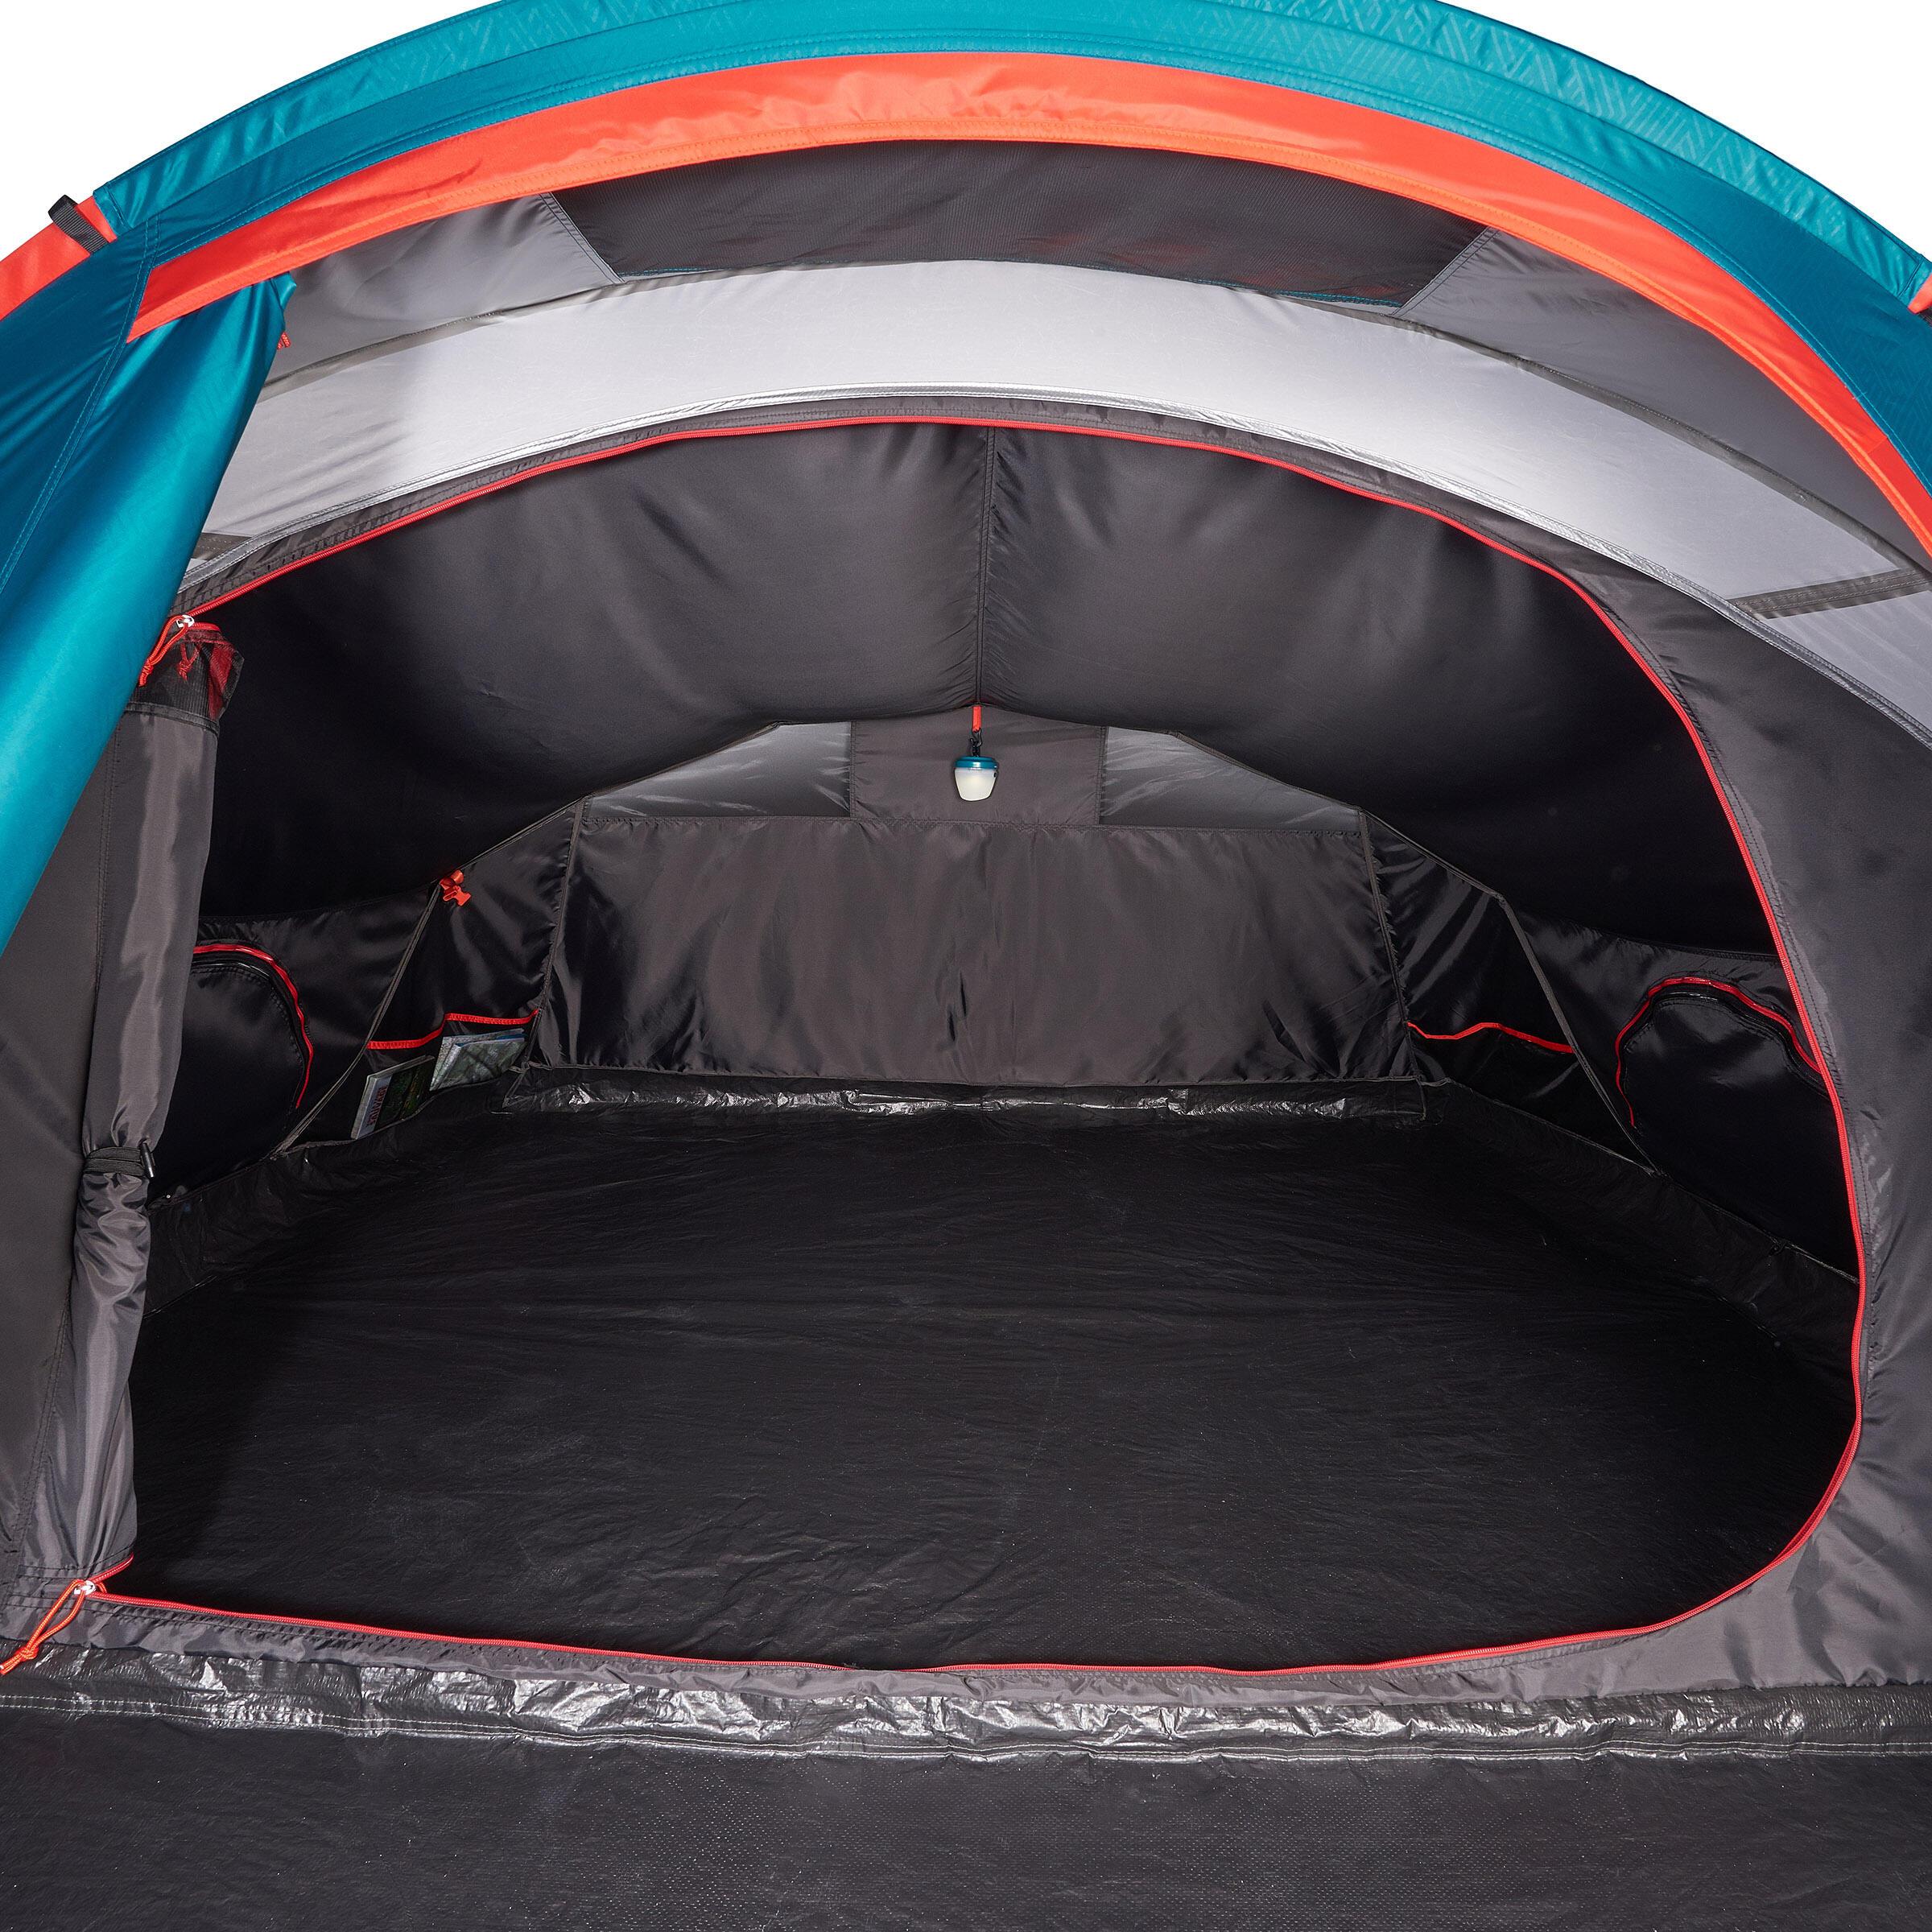 Chambre Pour Tente Quechua 2 Seconds 3 Xl Fresh Black Quechua Decathlon